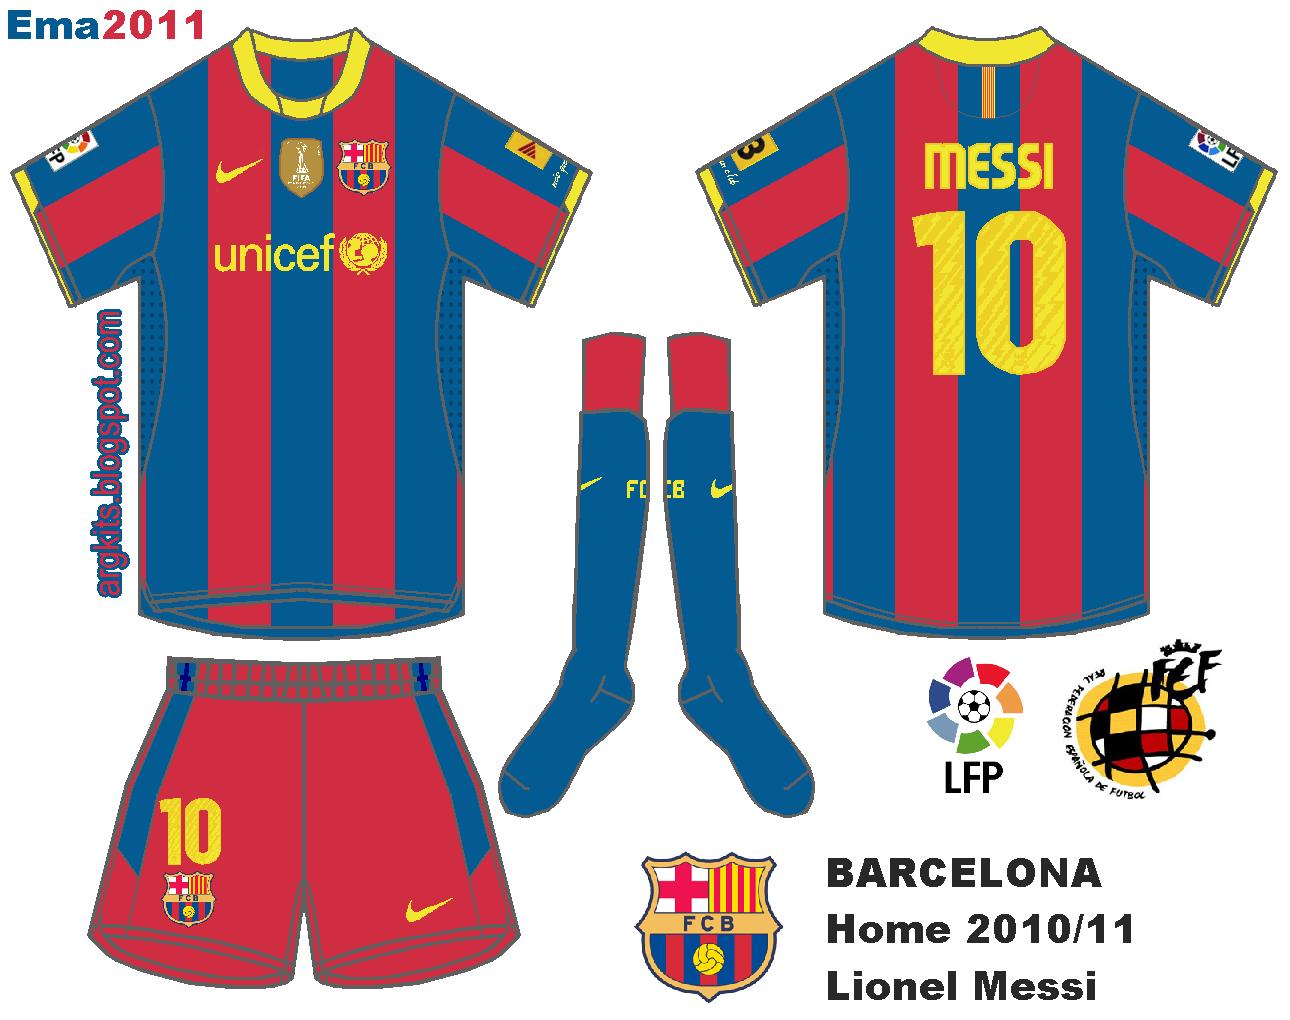 Dibujos Escudos De Futbol Para Colorear: Imagenes De Equipos De Futbol Para Colorear